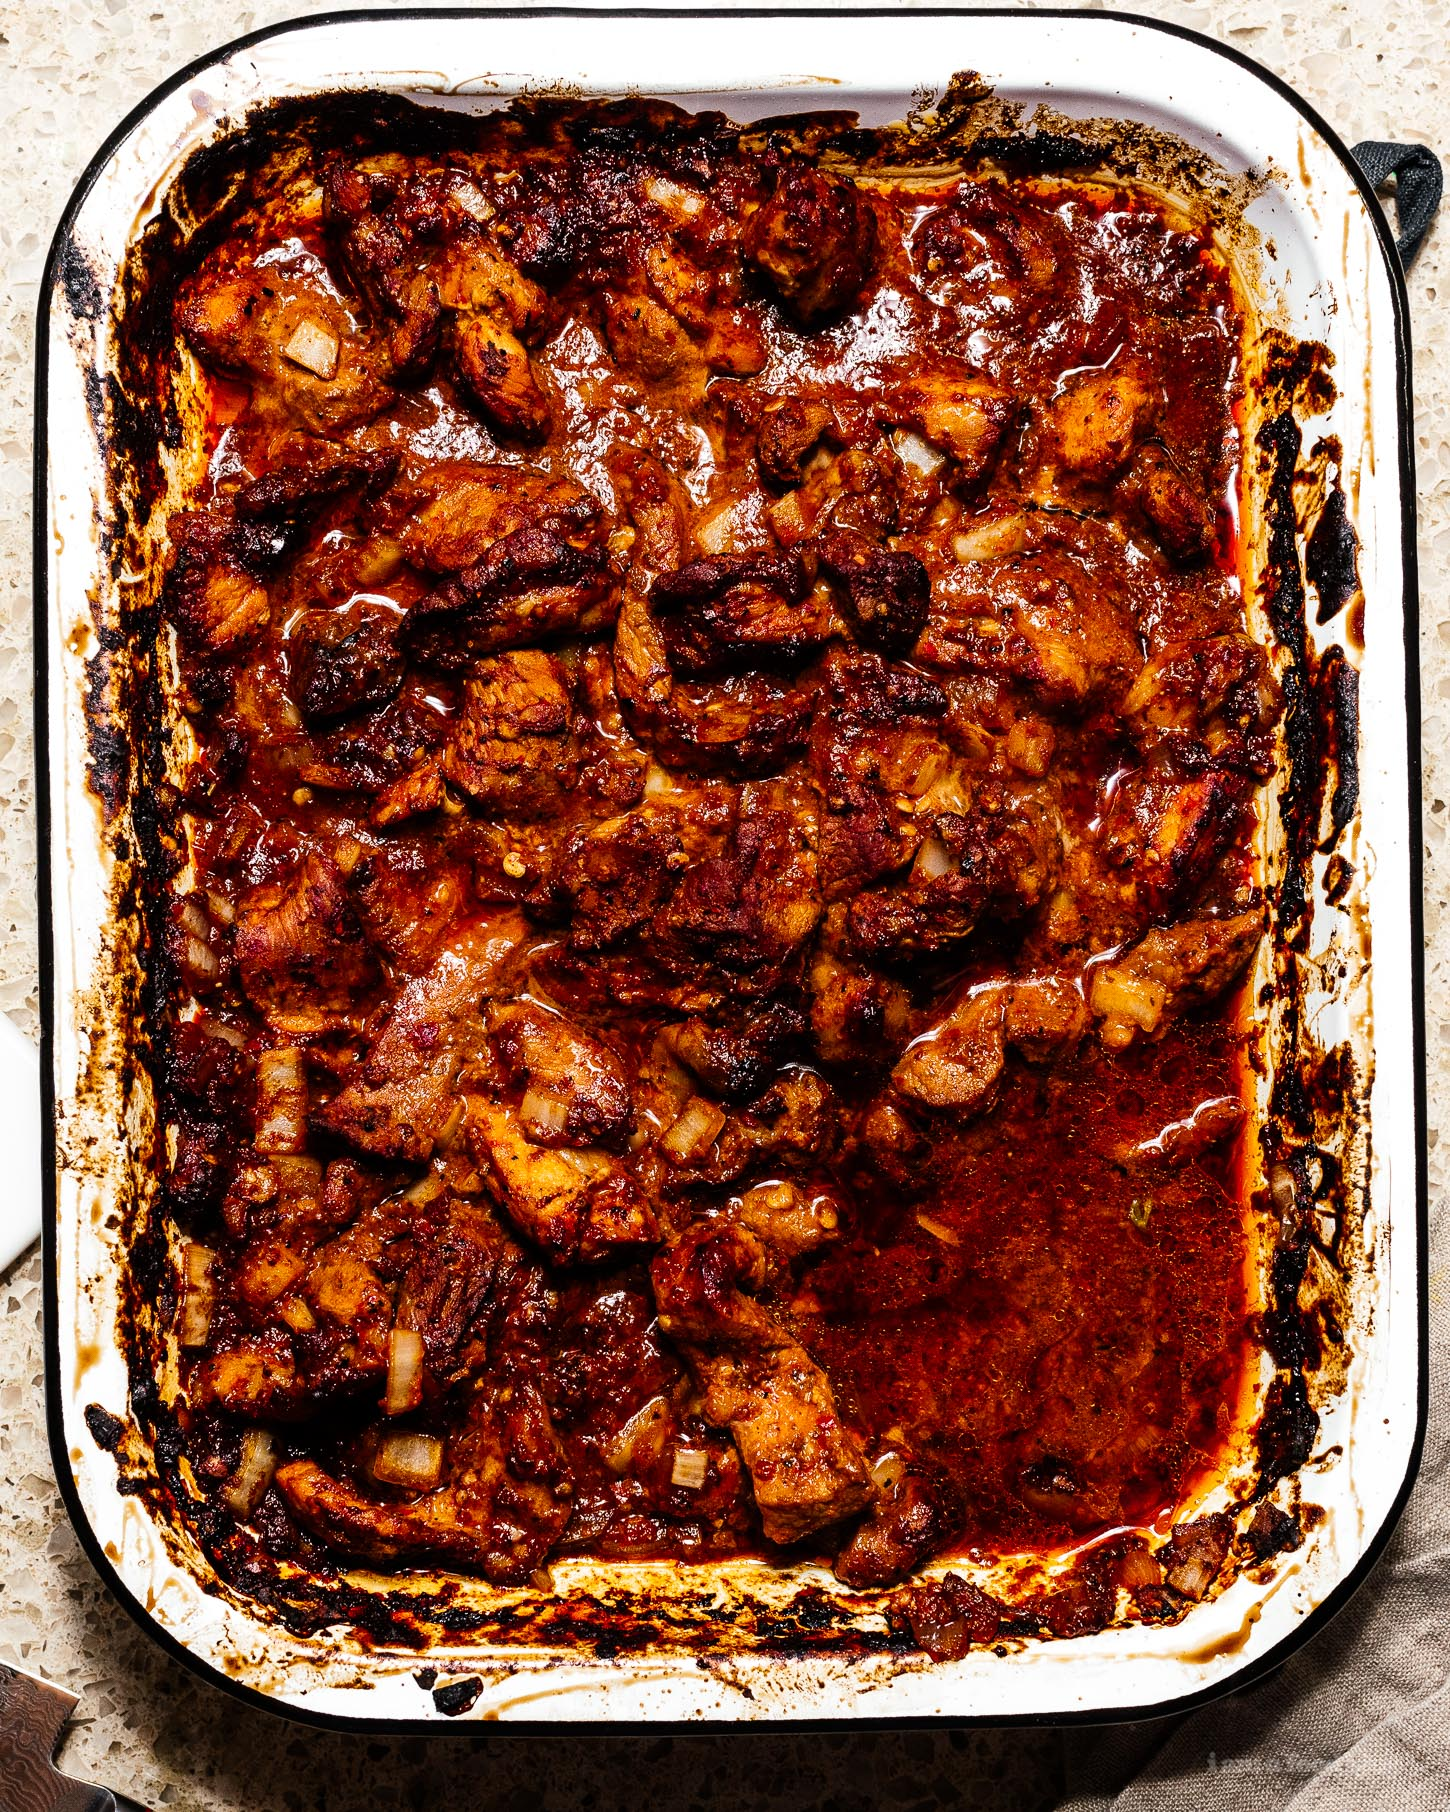 oven baked weeknight carne adovada pork taco recipe | www.iamafoodblog.com